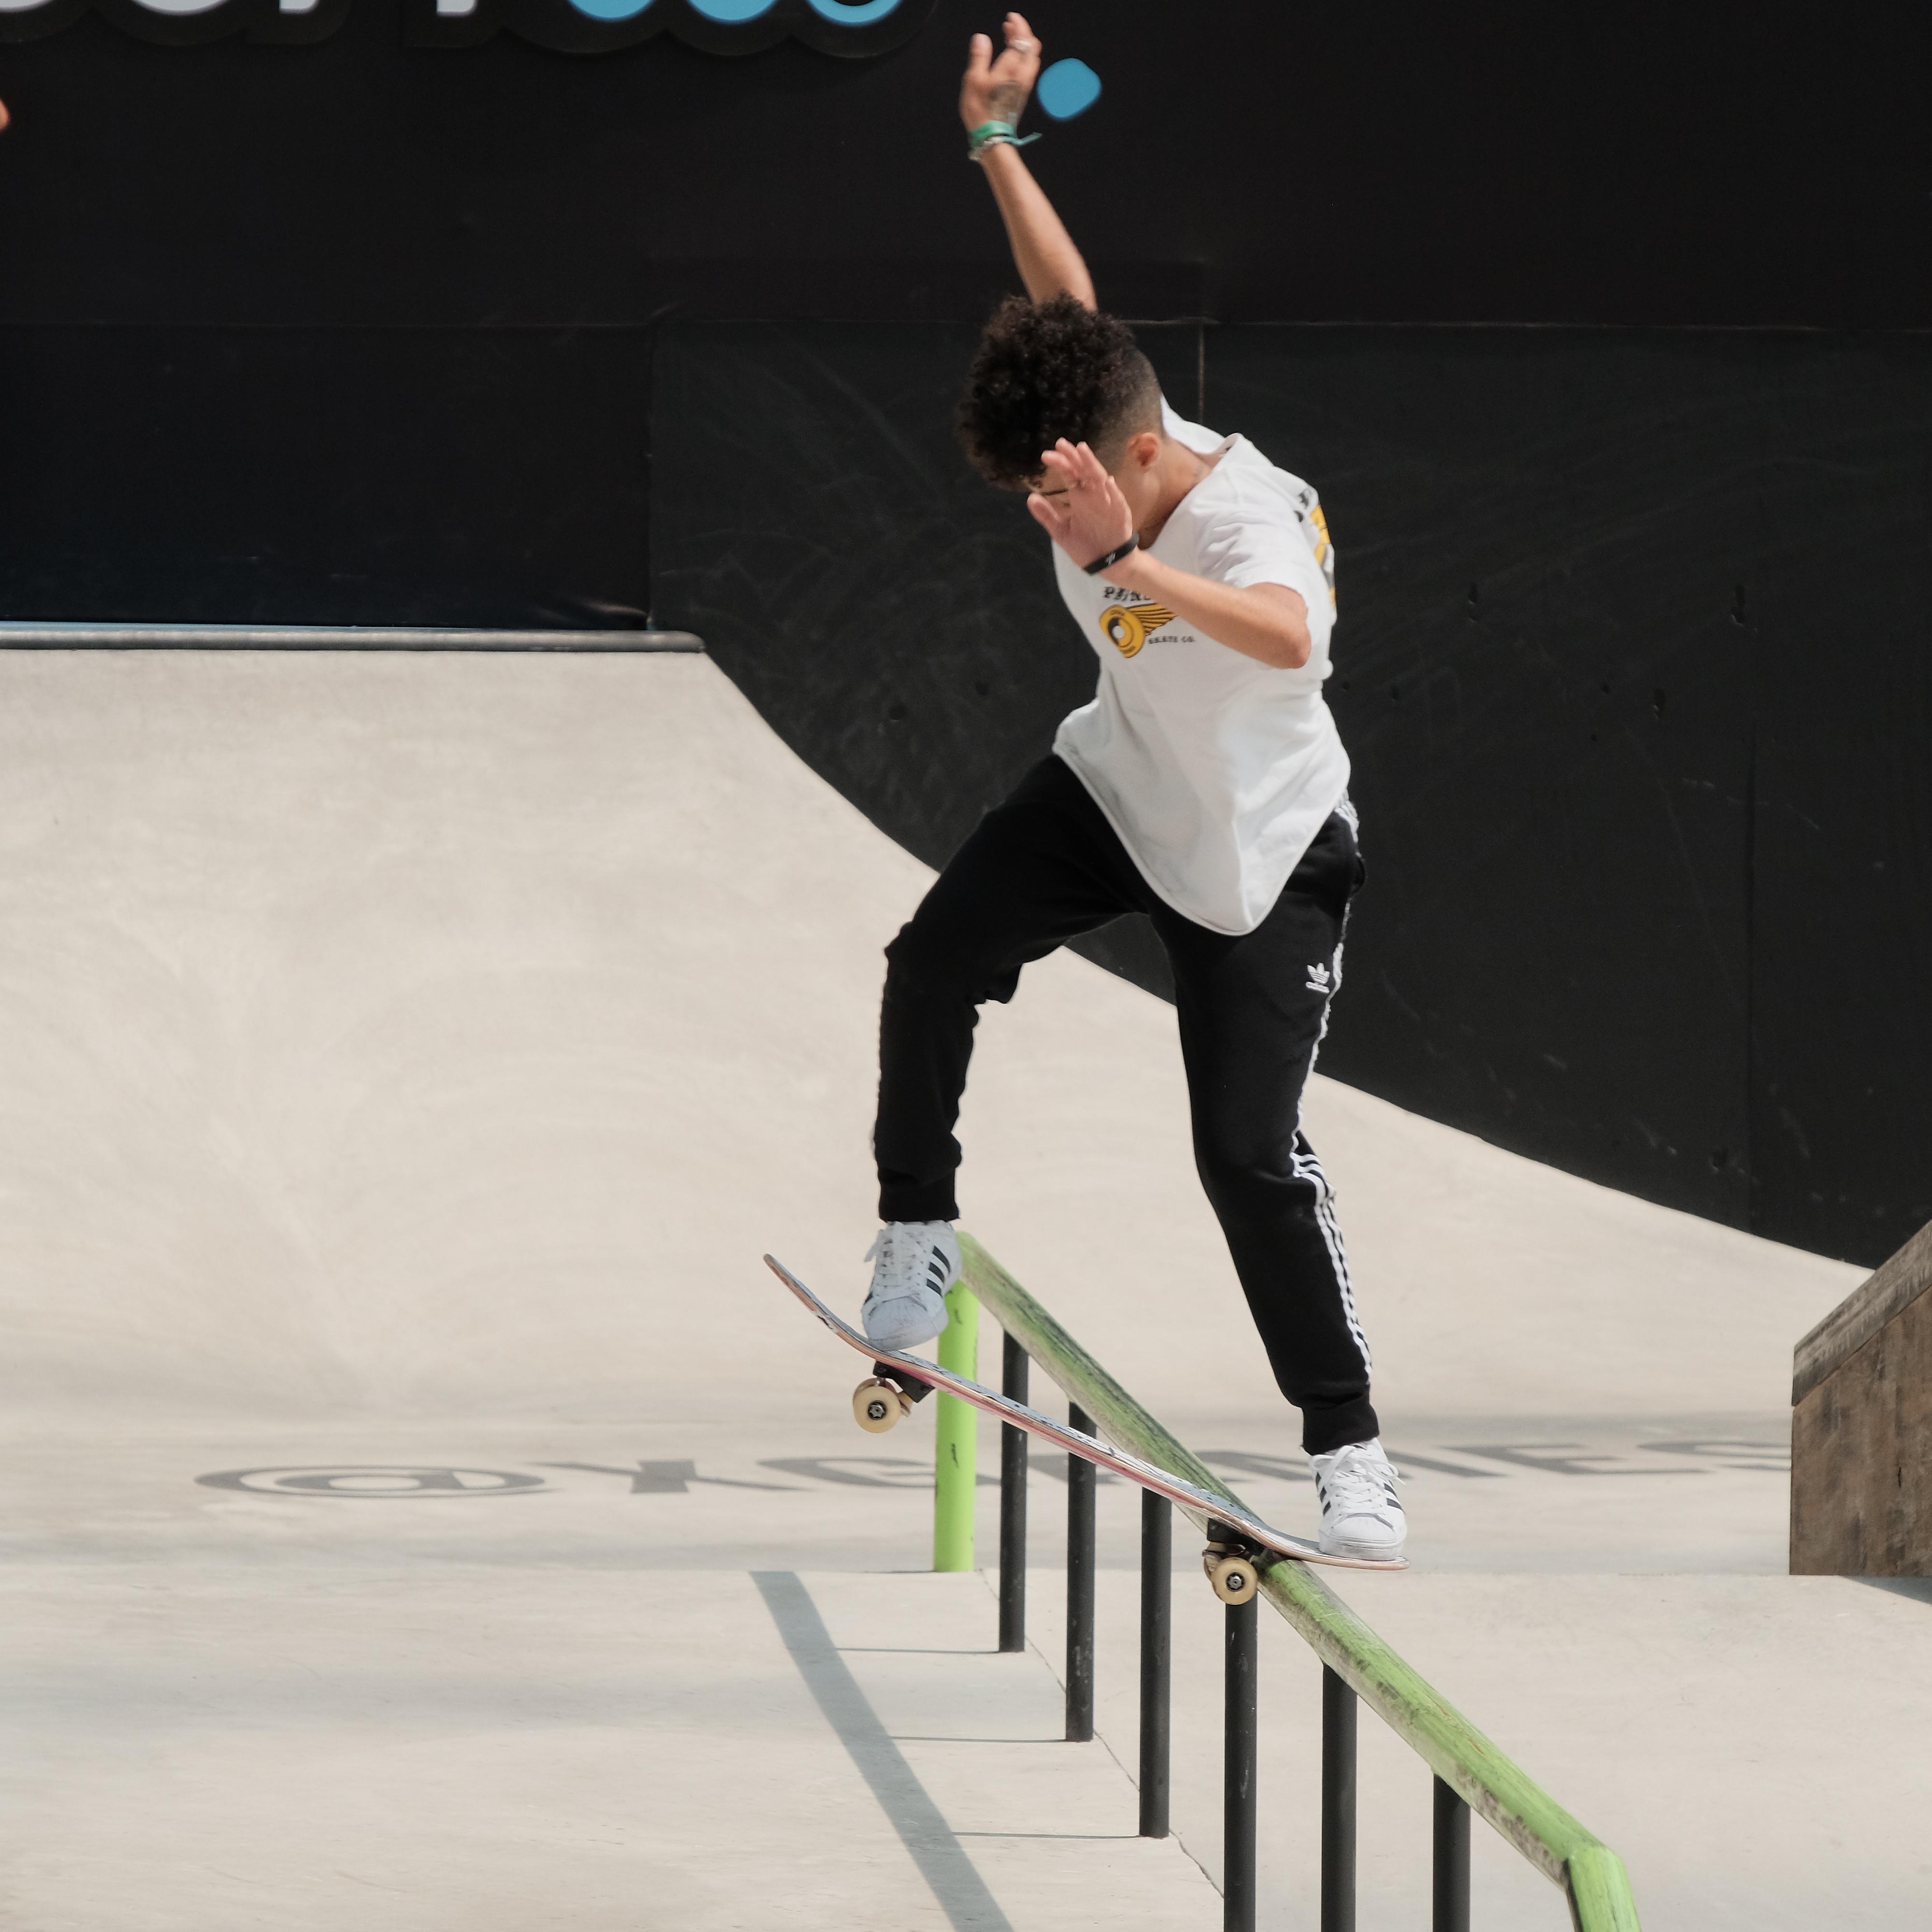 jenn soto usa skateboarding